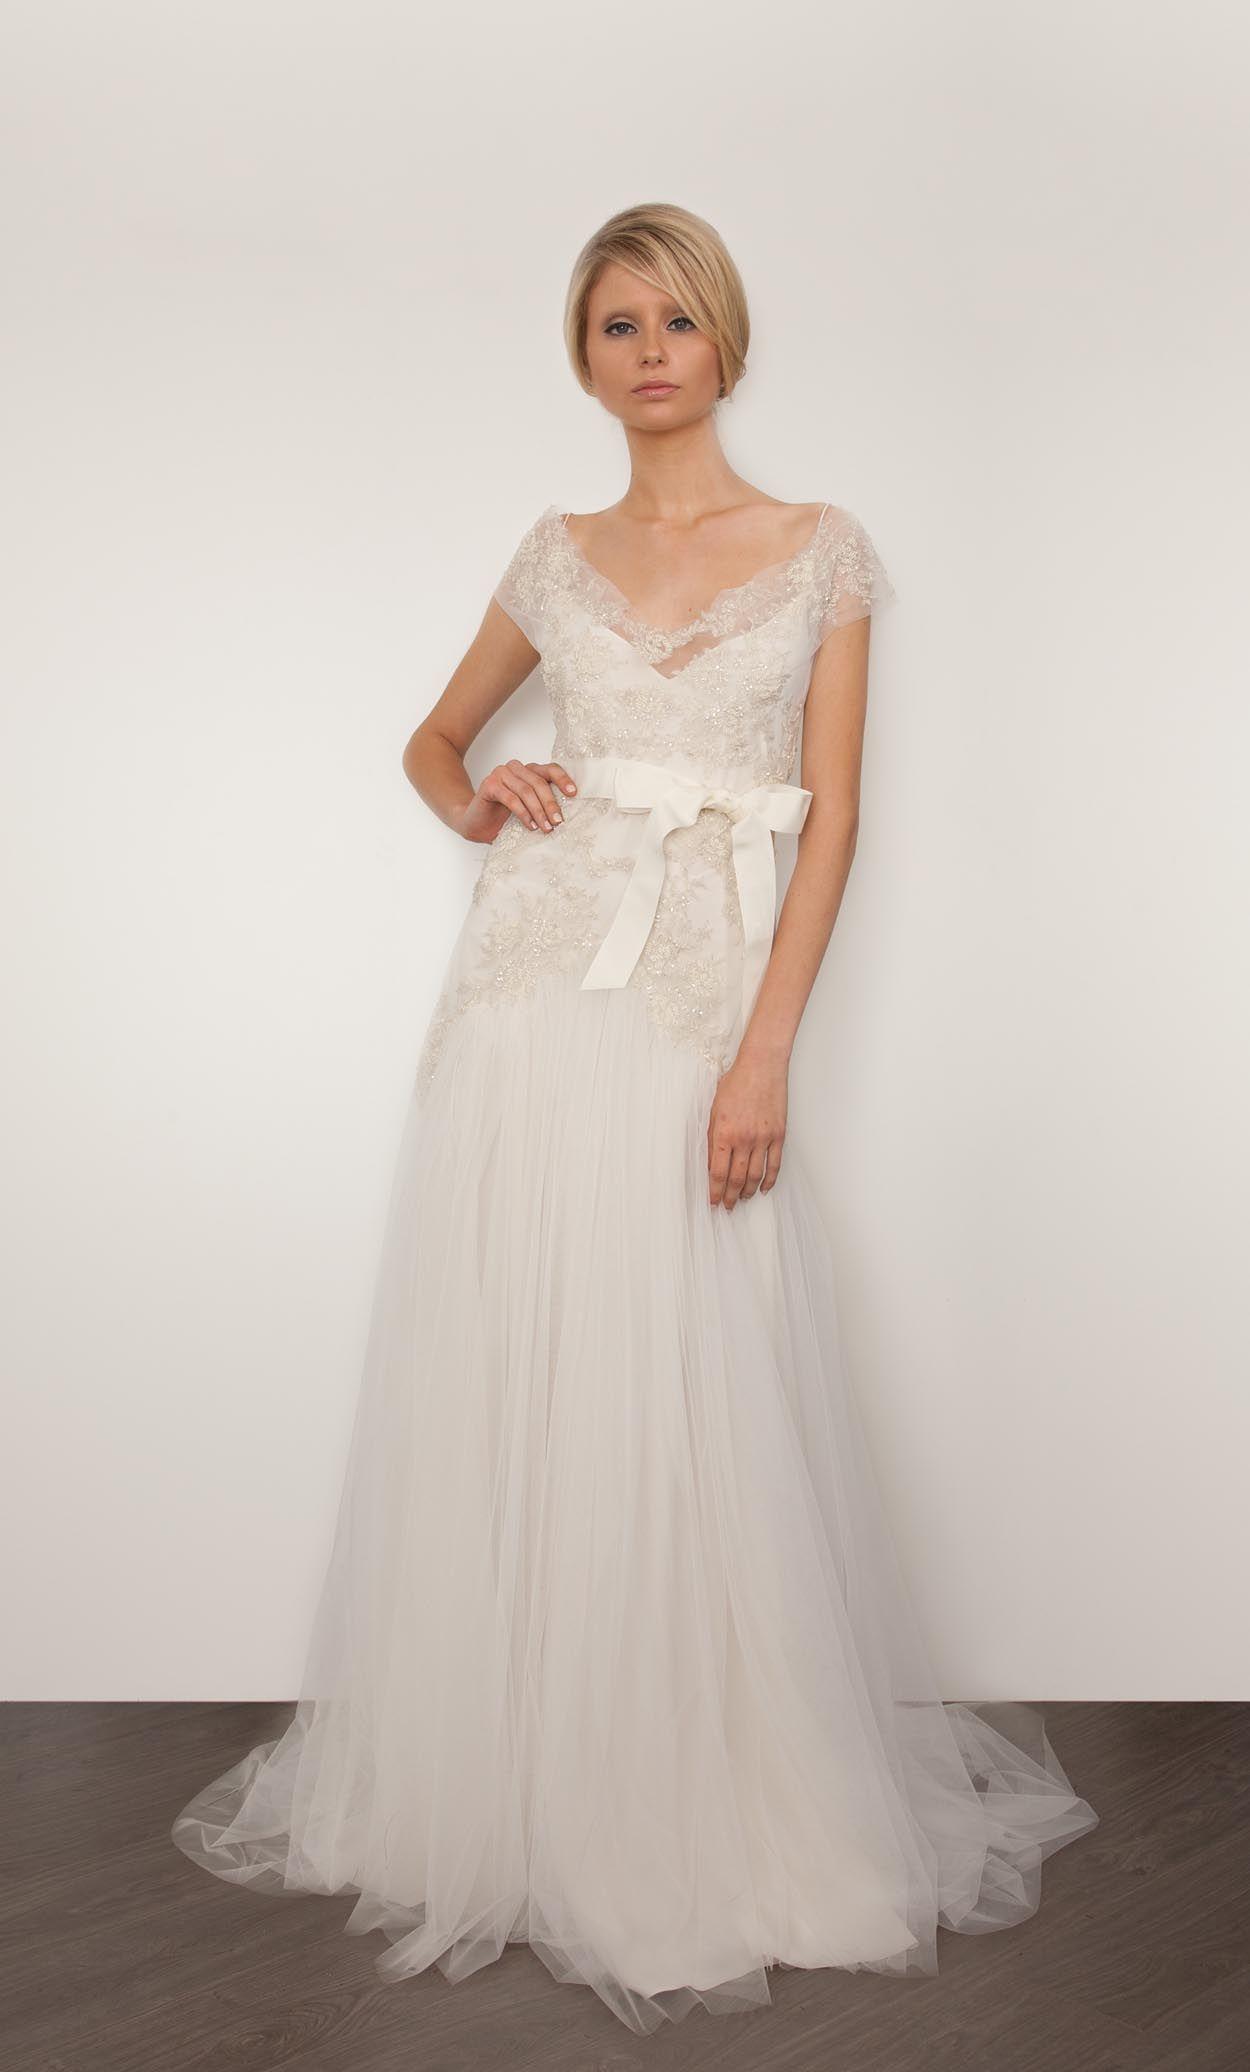 Sarah janks bridal couture clothes pinterest wedding